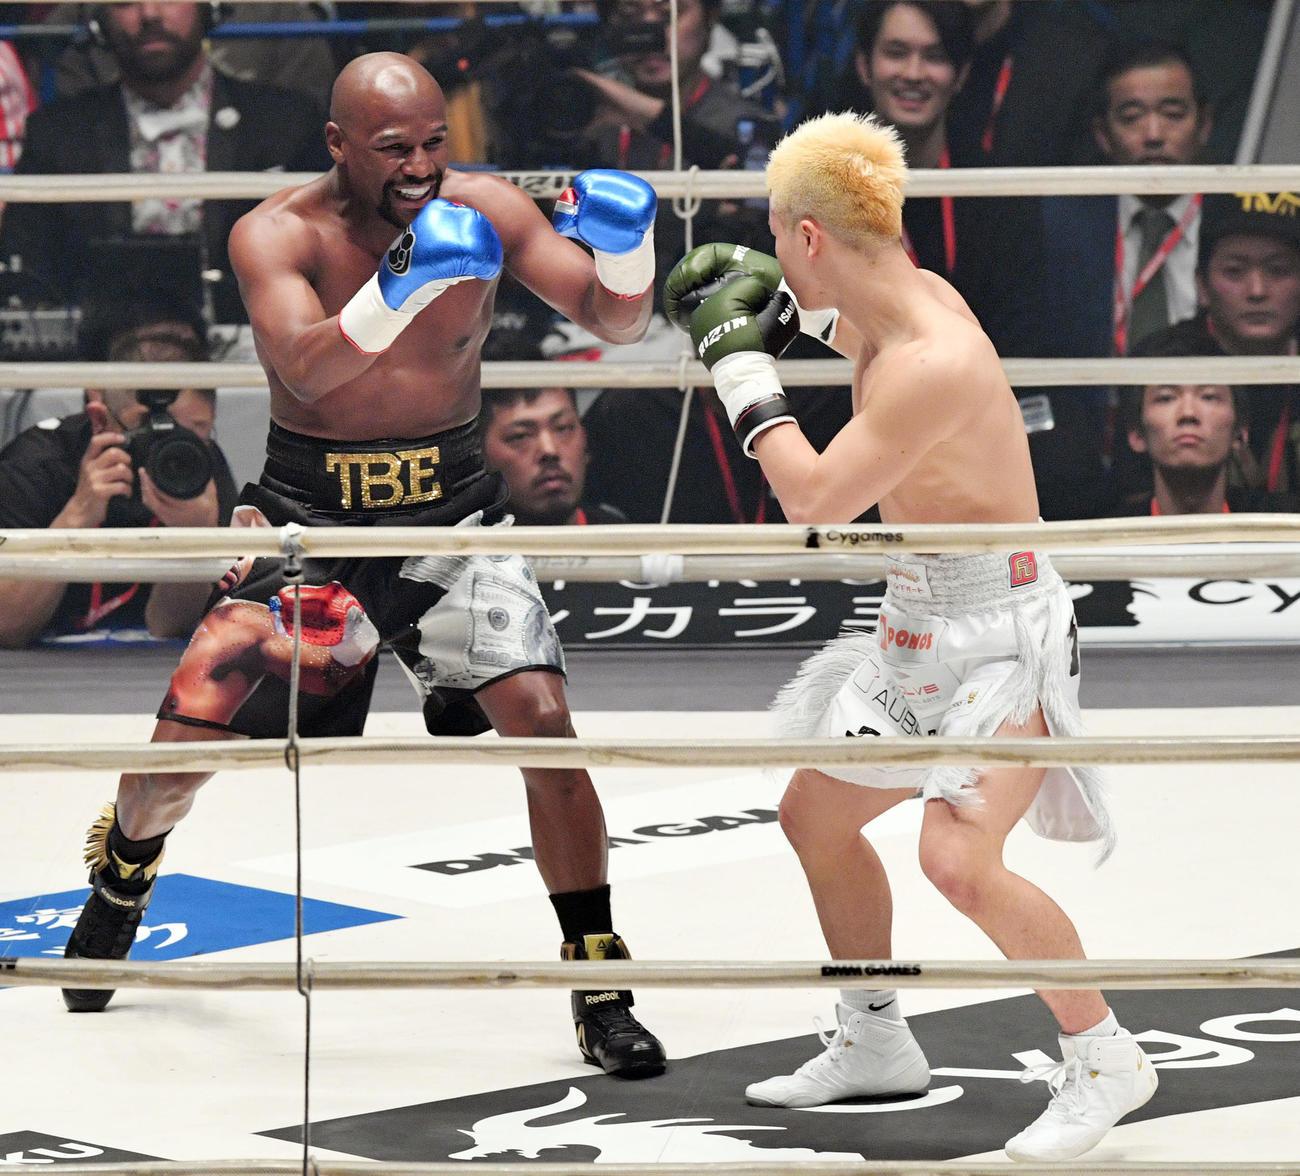 http://www.nikkansports.com/battle/news/img/201812310000950-w1300_1.jpg